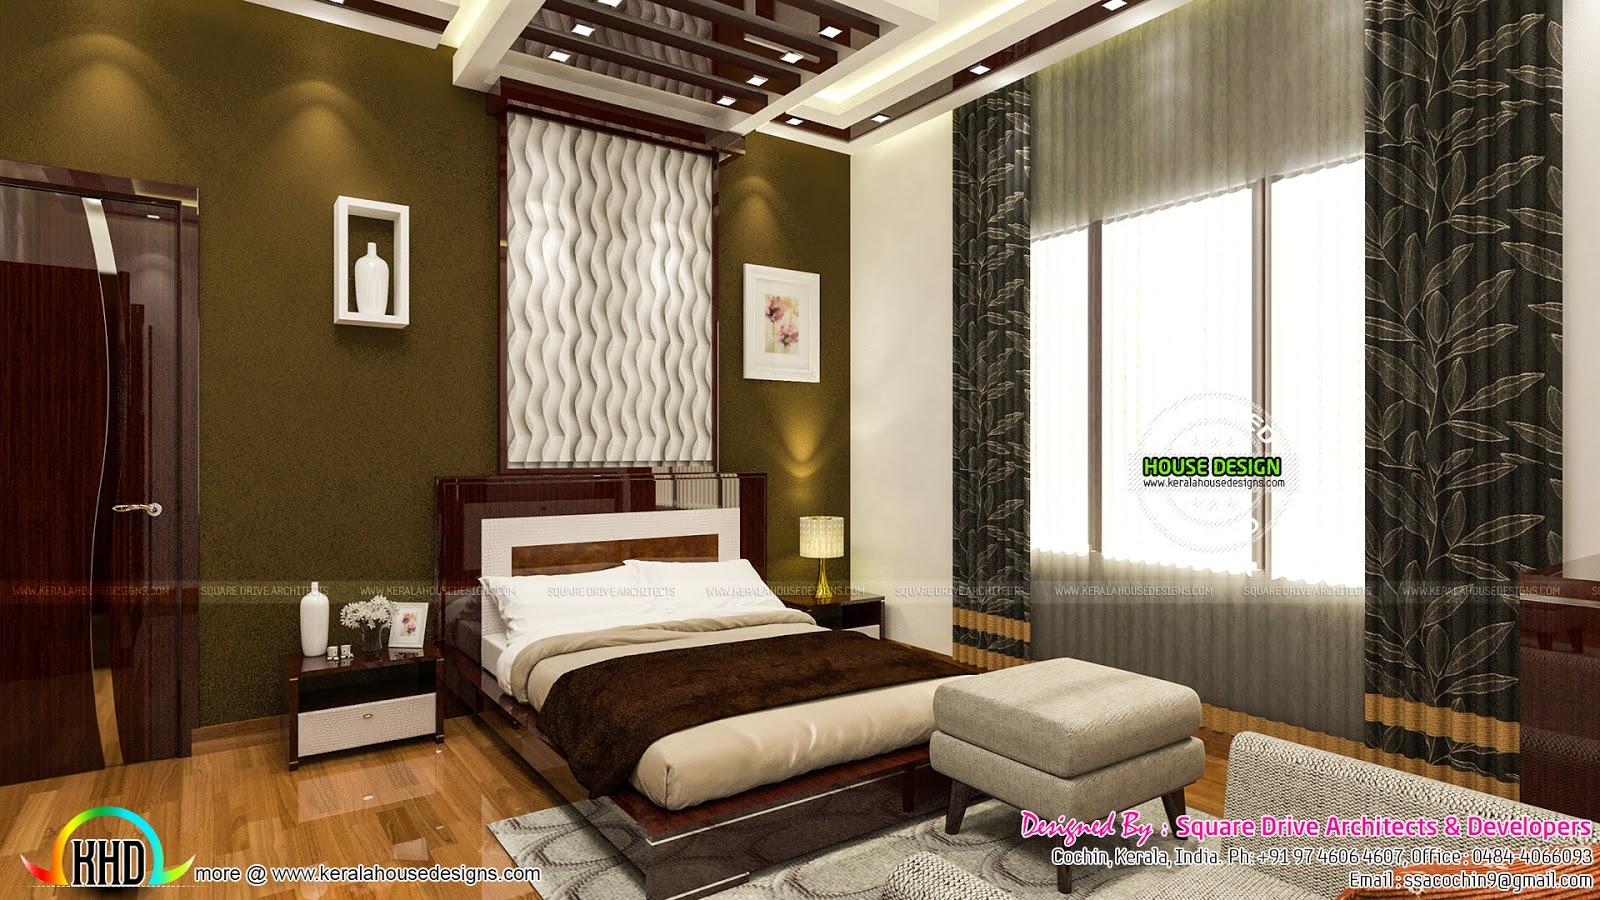 Bedroom, Living, Prayer Room And Study Room